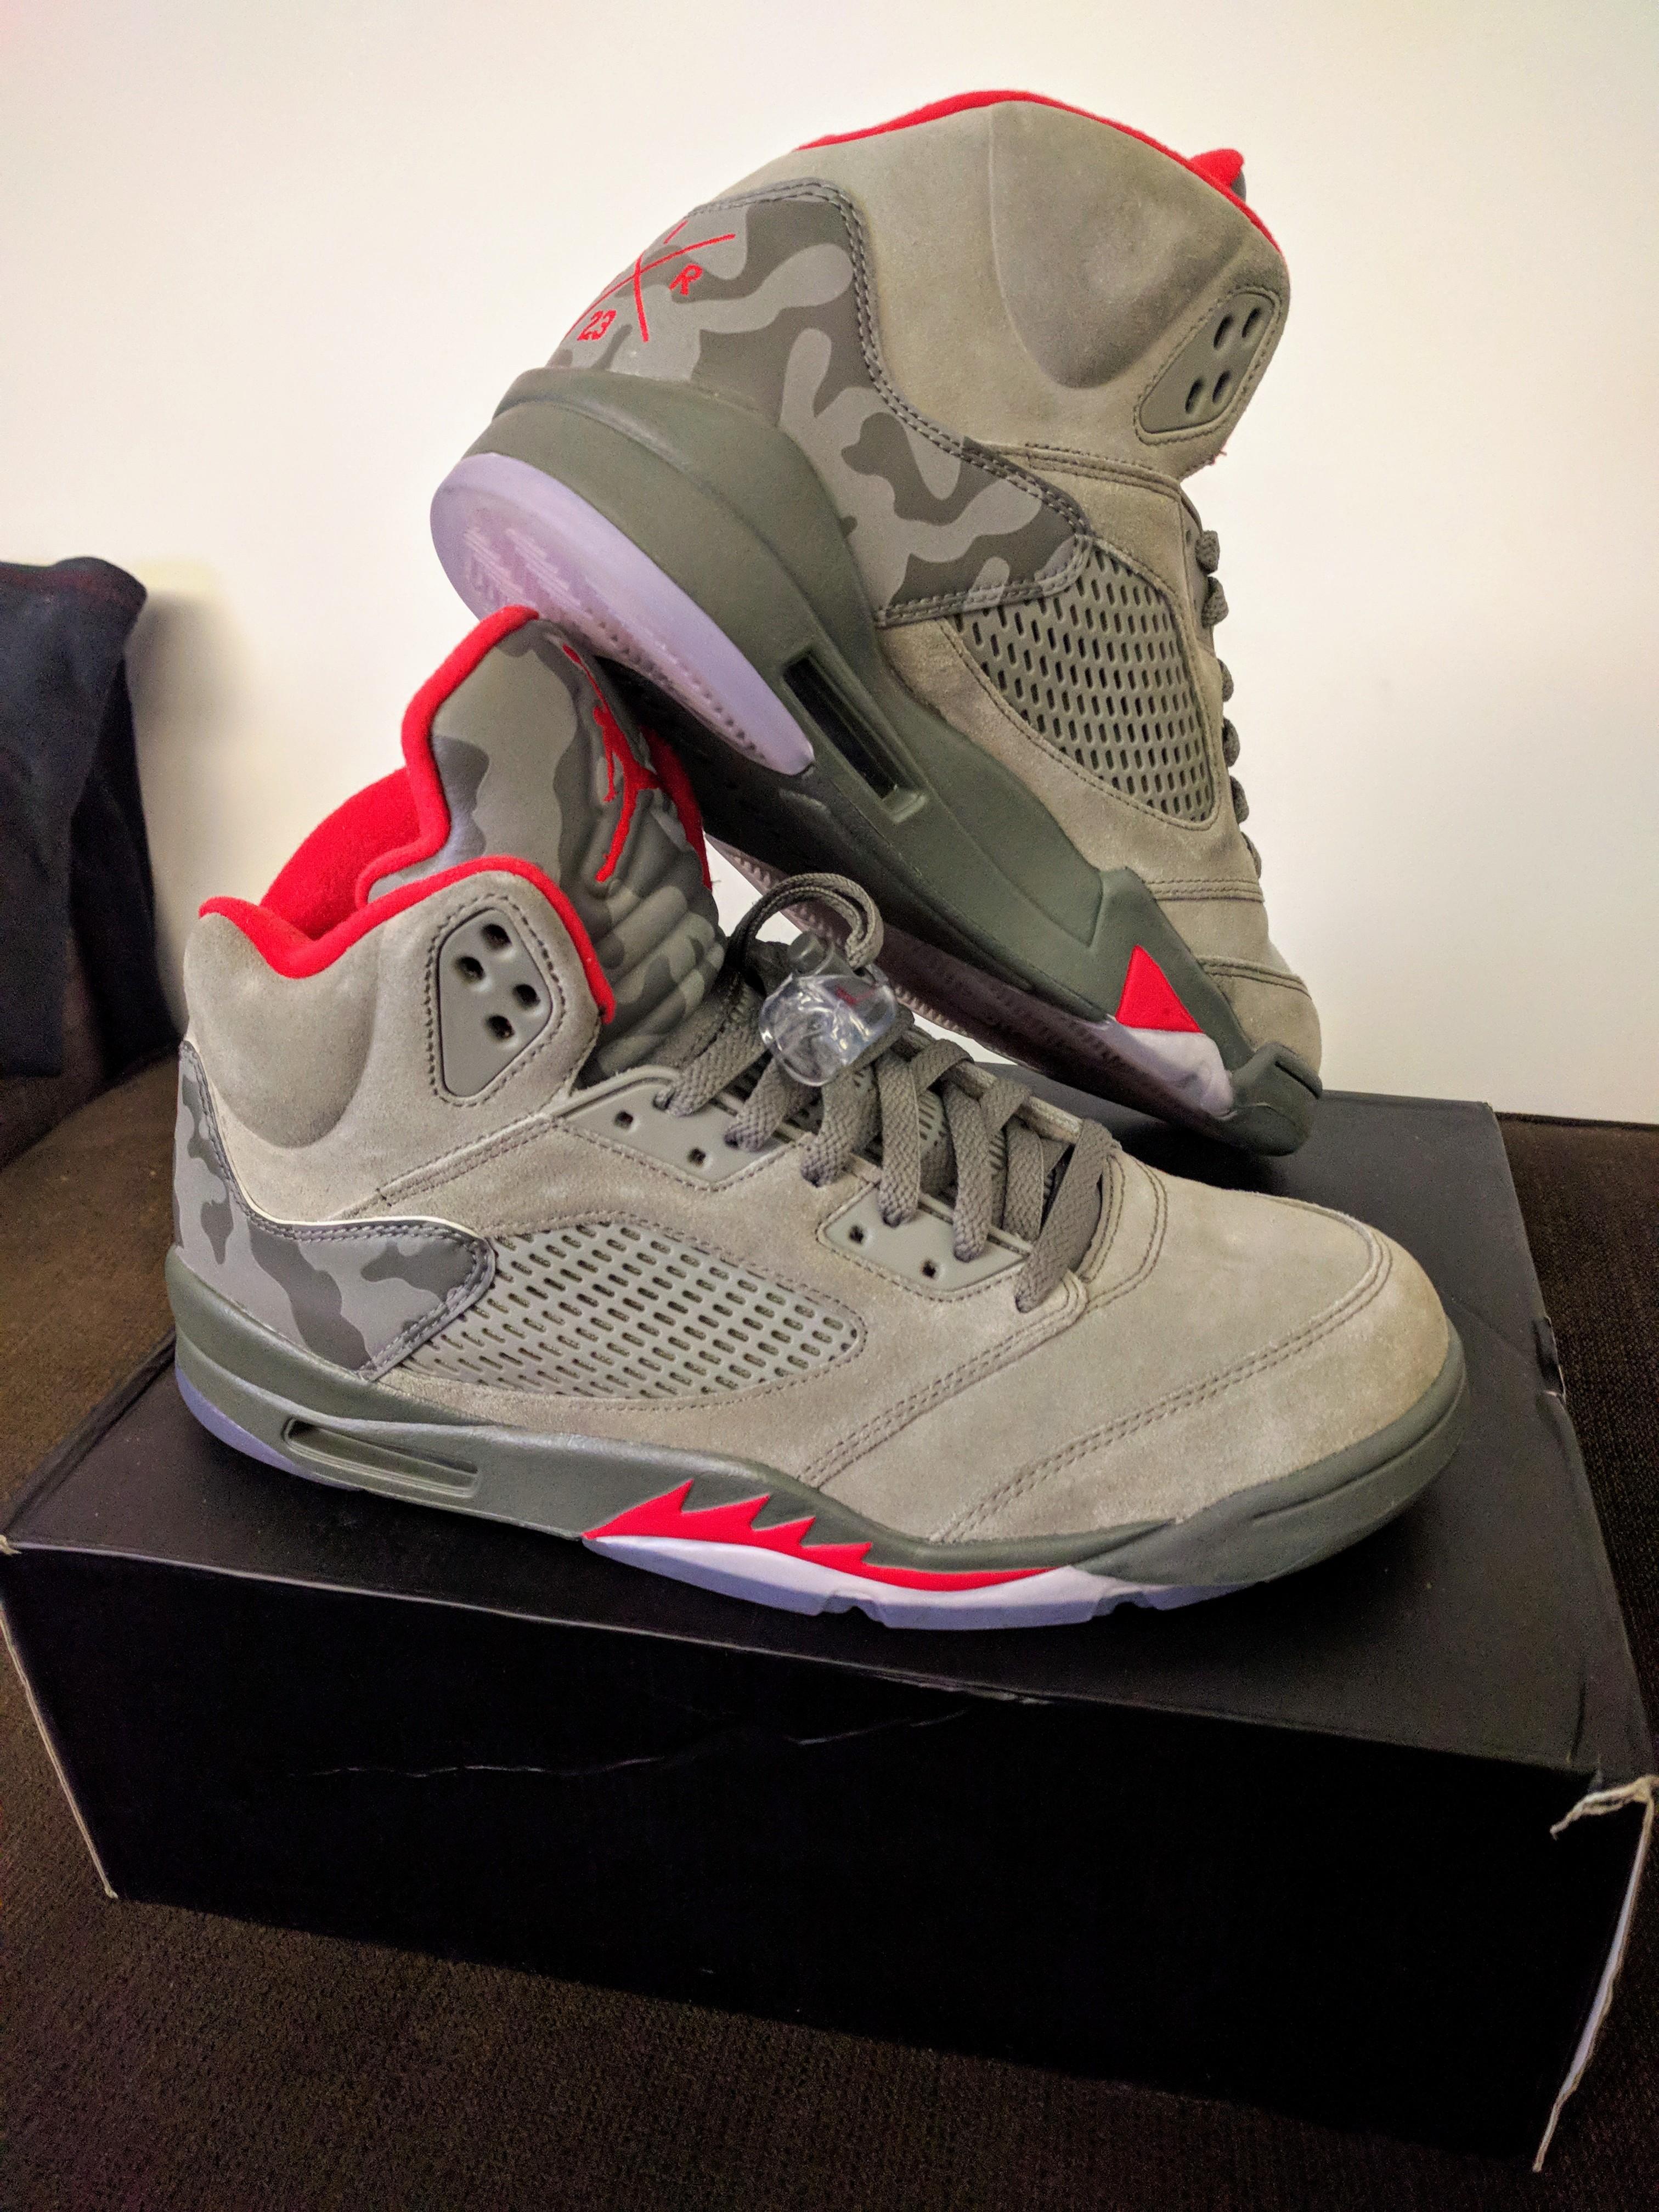 online store 0bbd5 49a04 Jordan 5 Retro P51 Camo